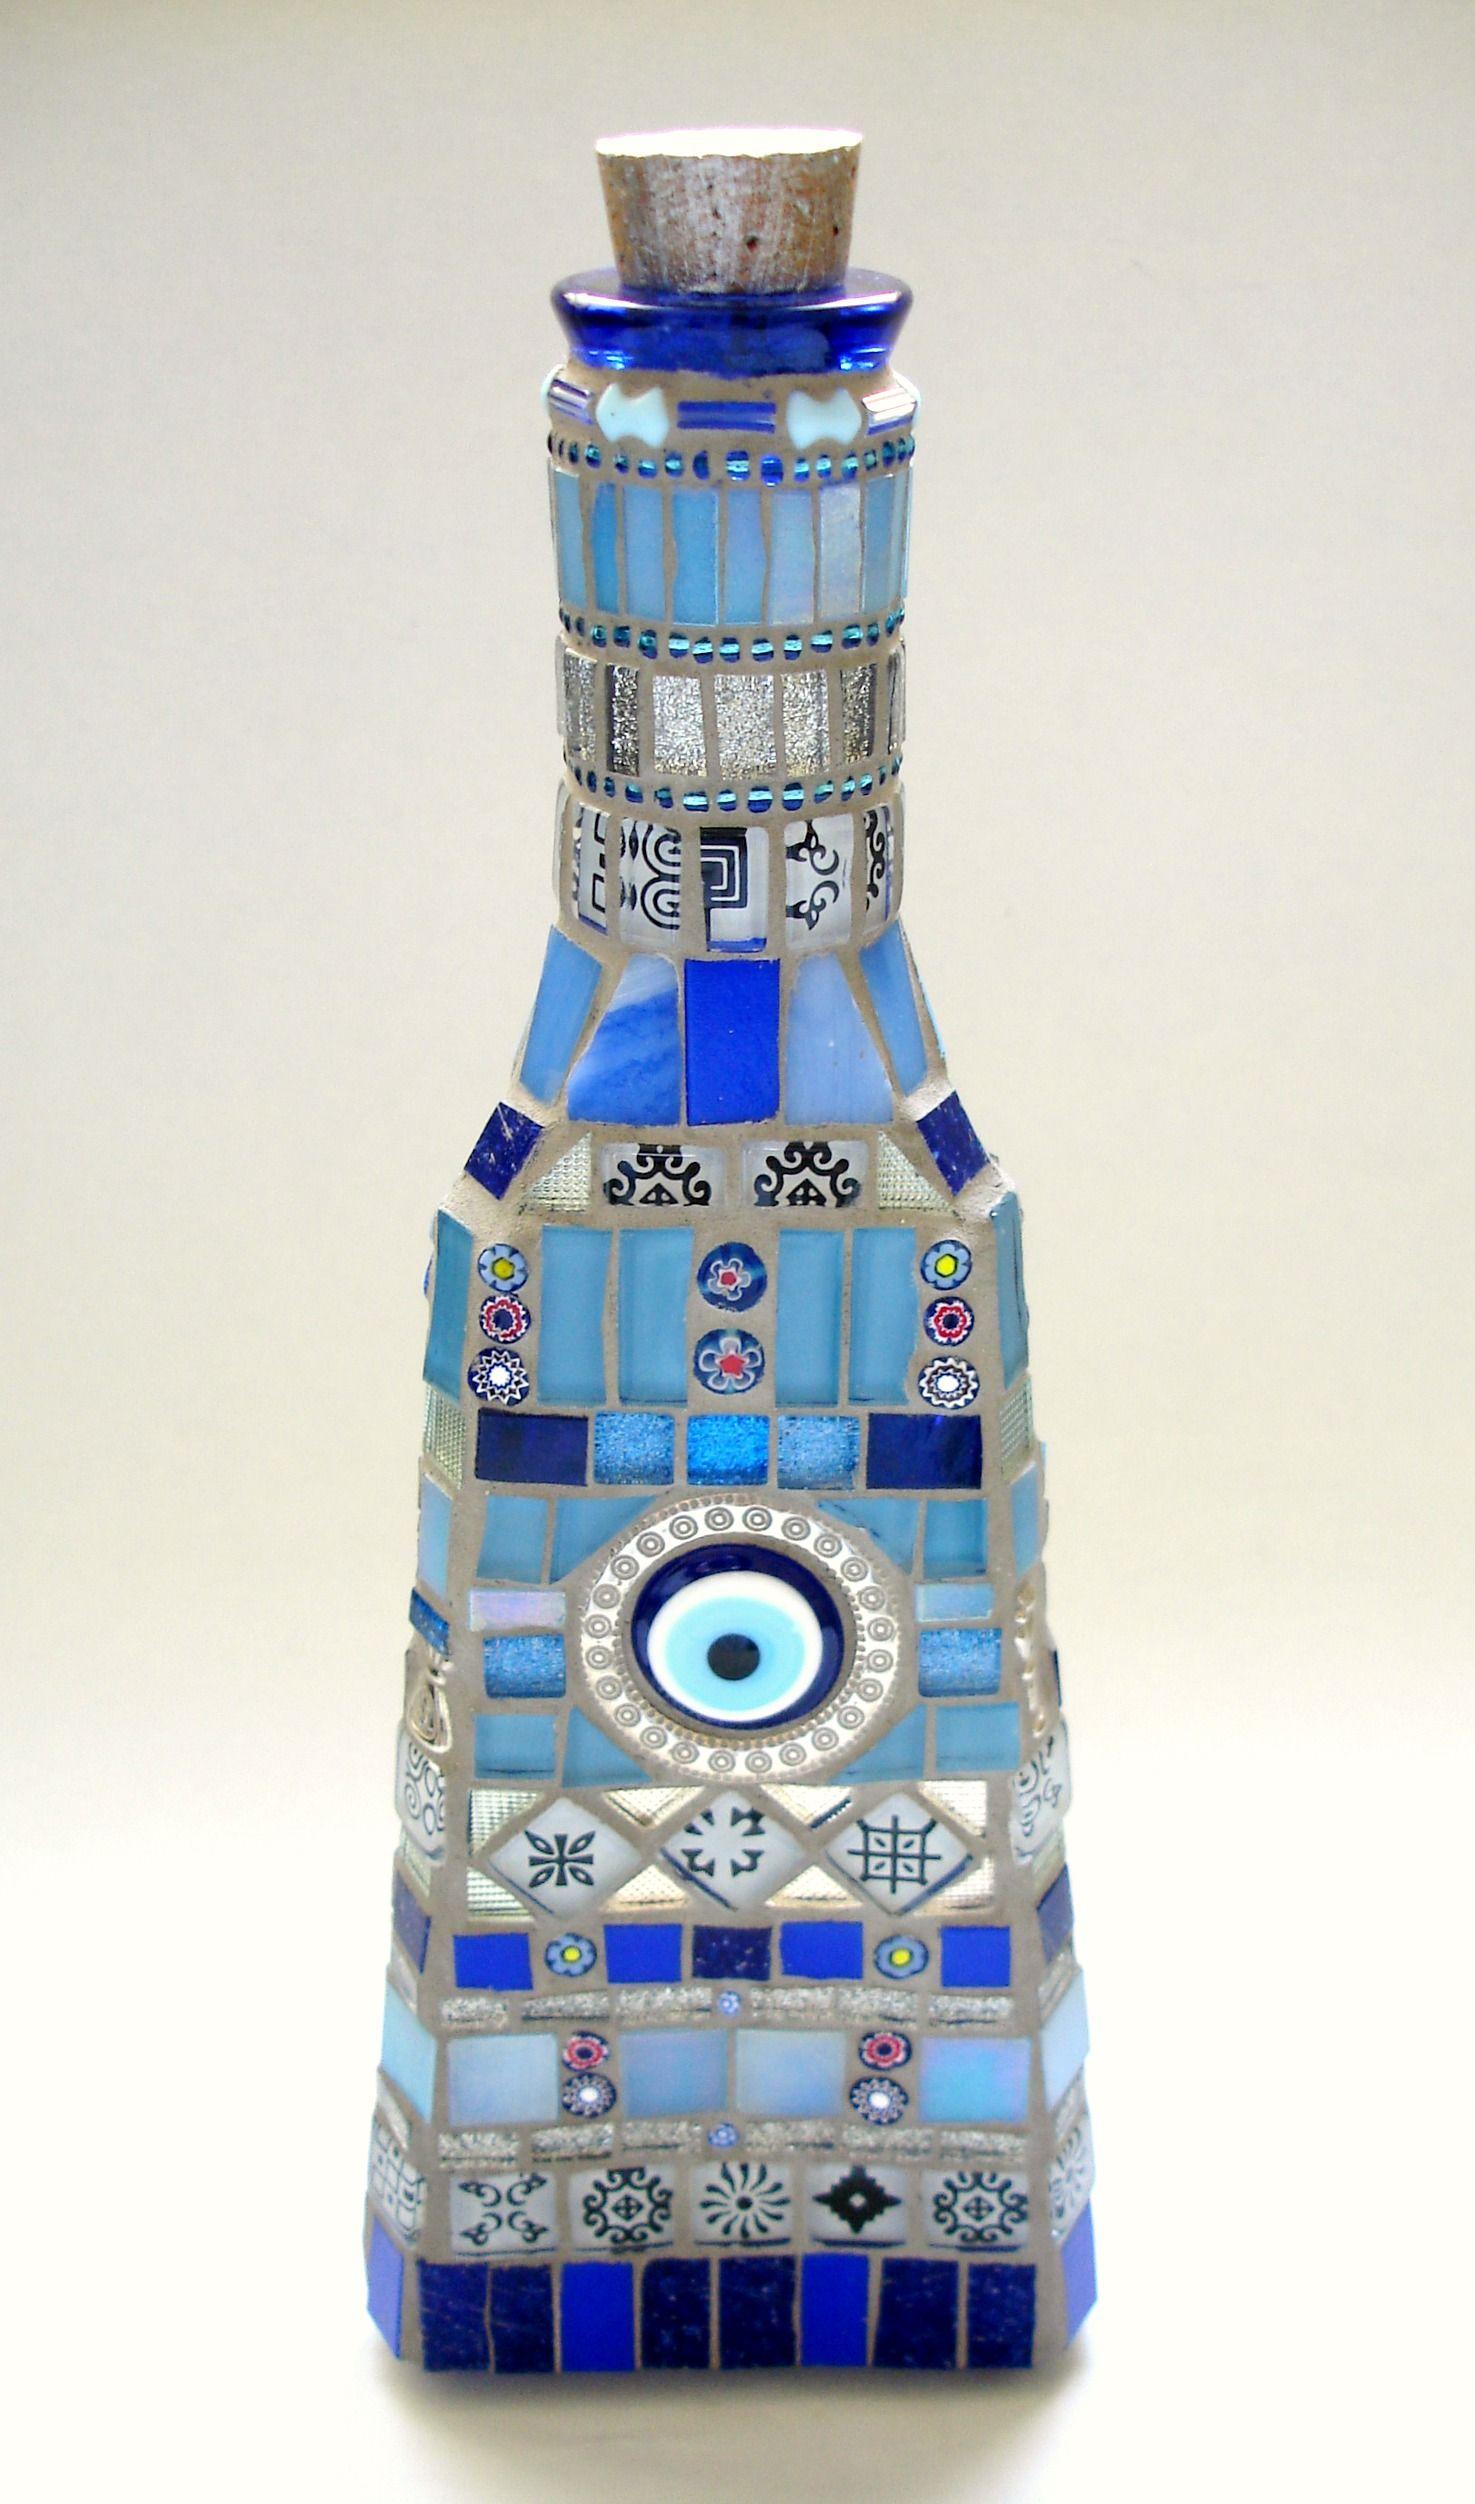 Decorated bottle by Lucano Mosaico. www.lucanomosaico.com.br